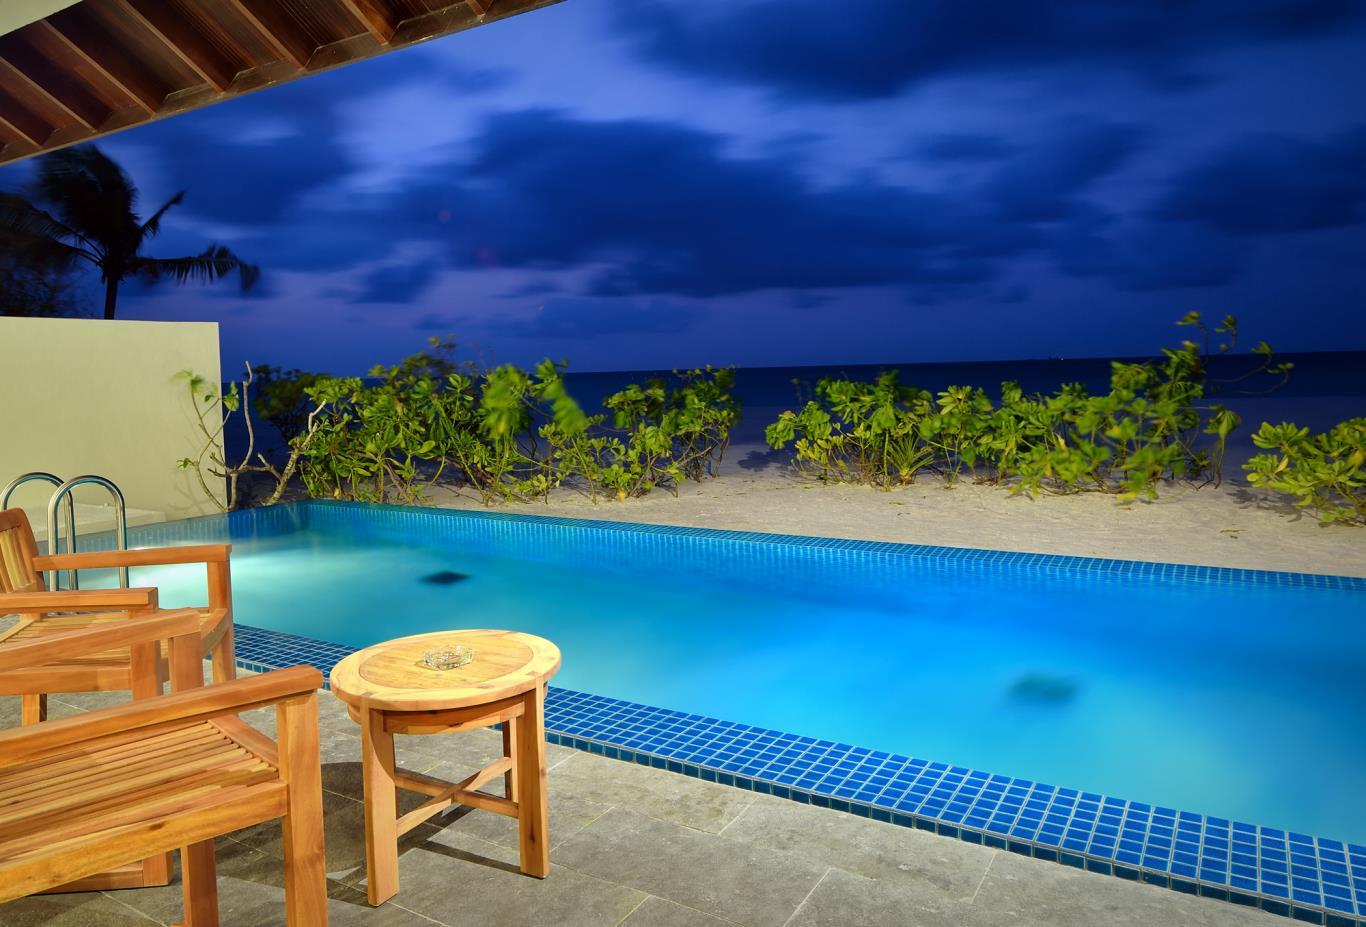 Sunset-pool-villa-exterior-at-dusk